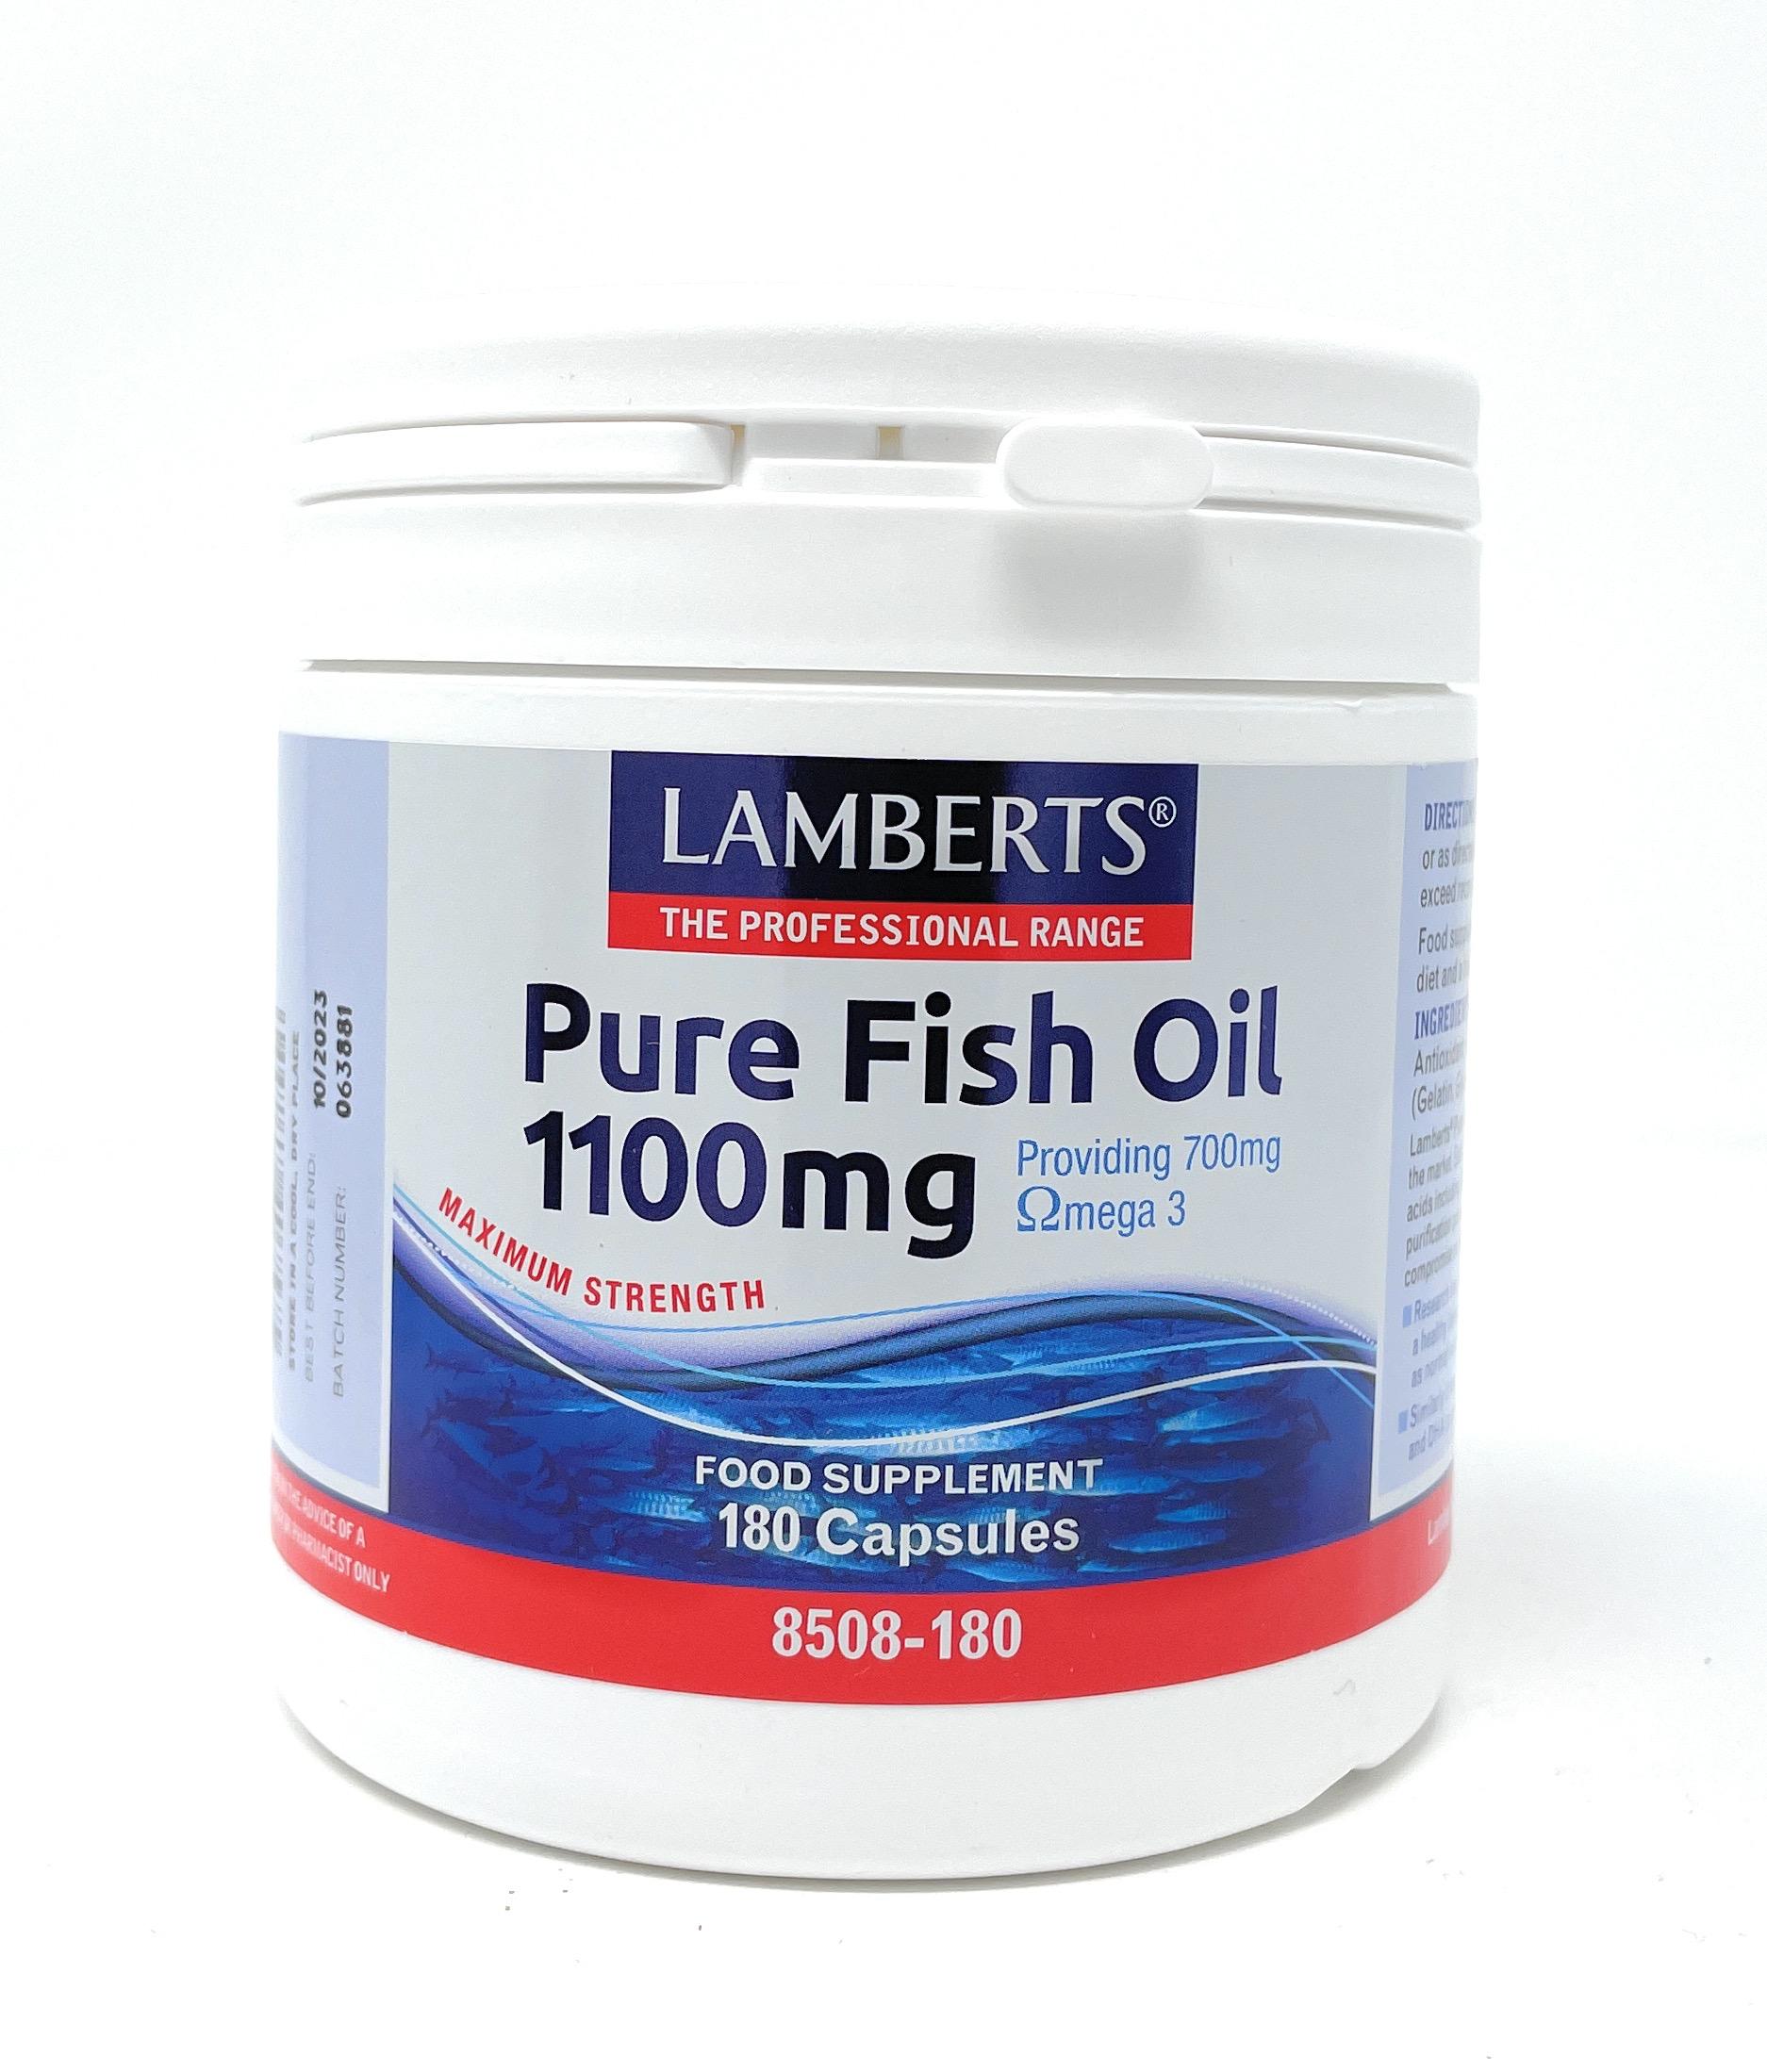 Lamberts Healthcare Pure Fish Oil (Fischöl) 1100mg 180 Softgels